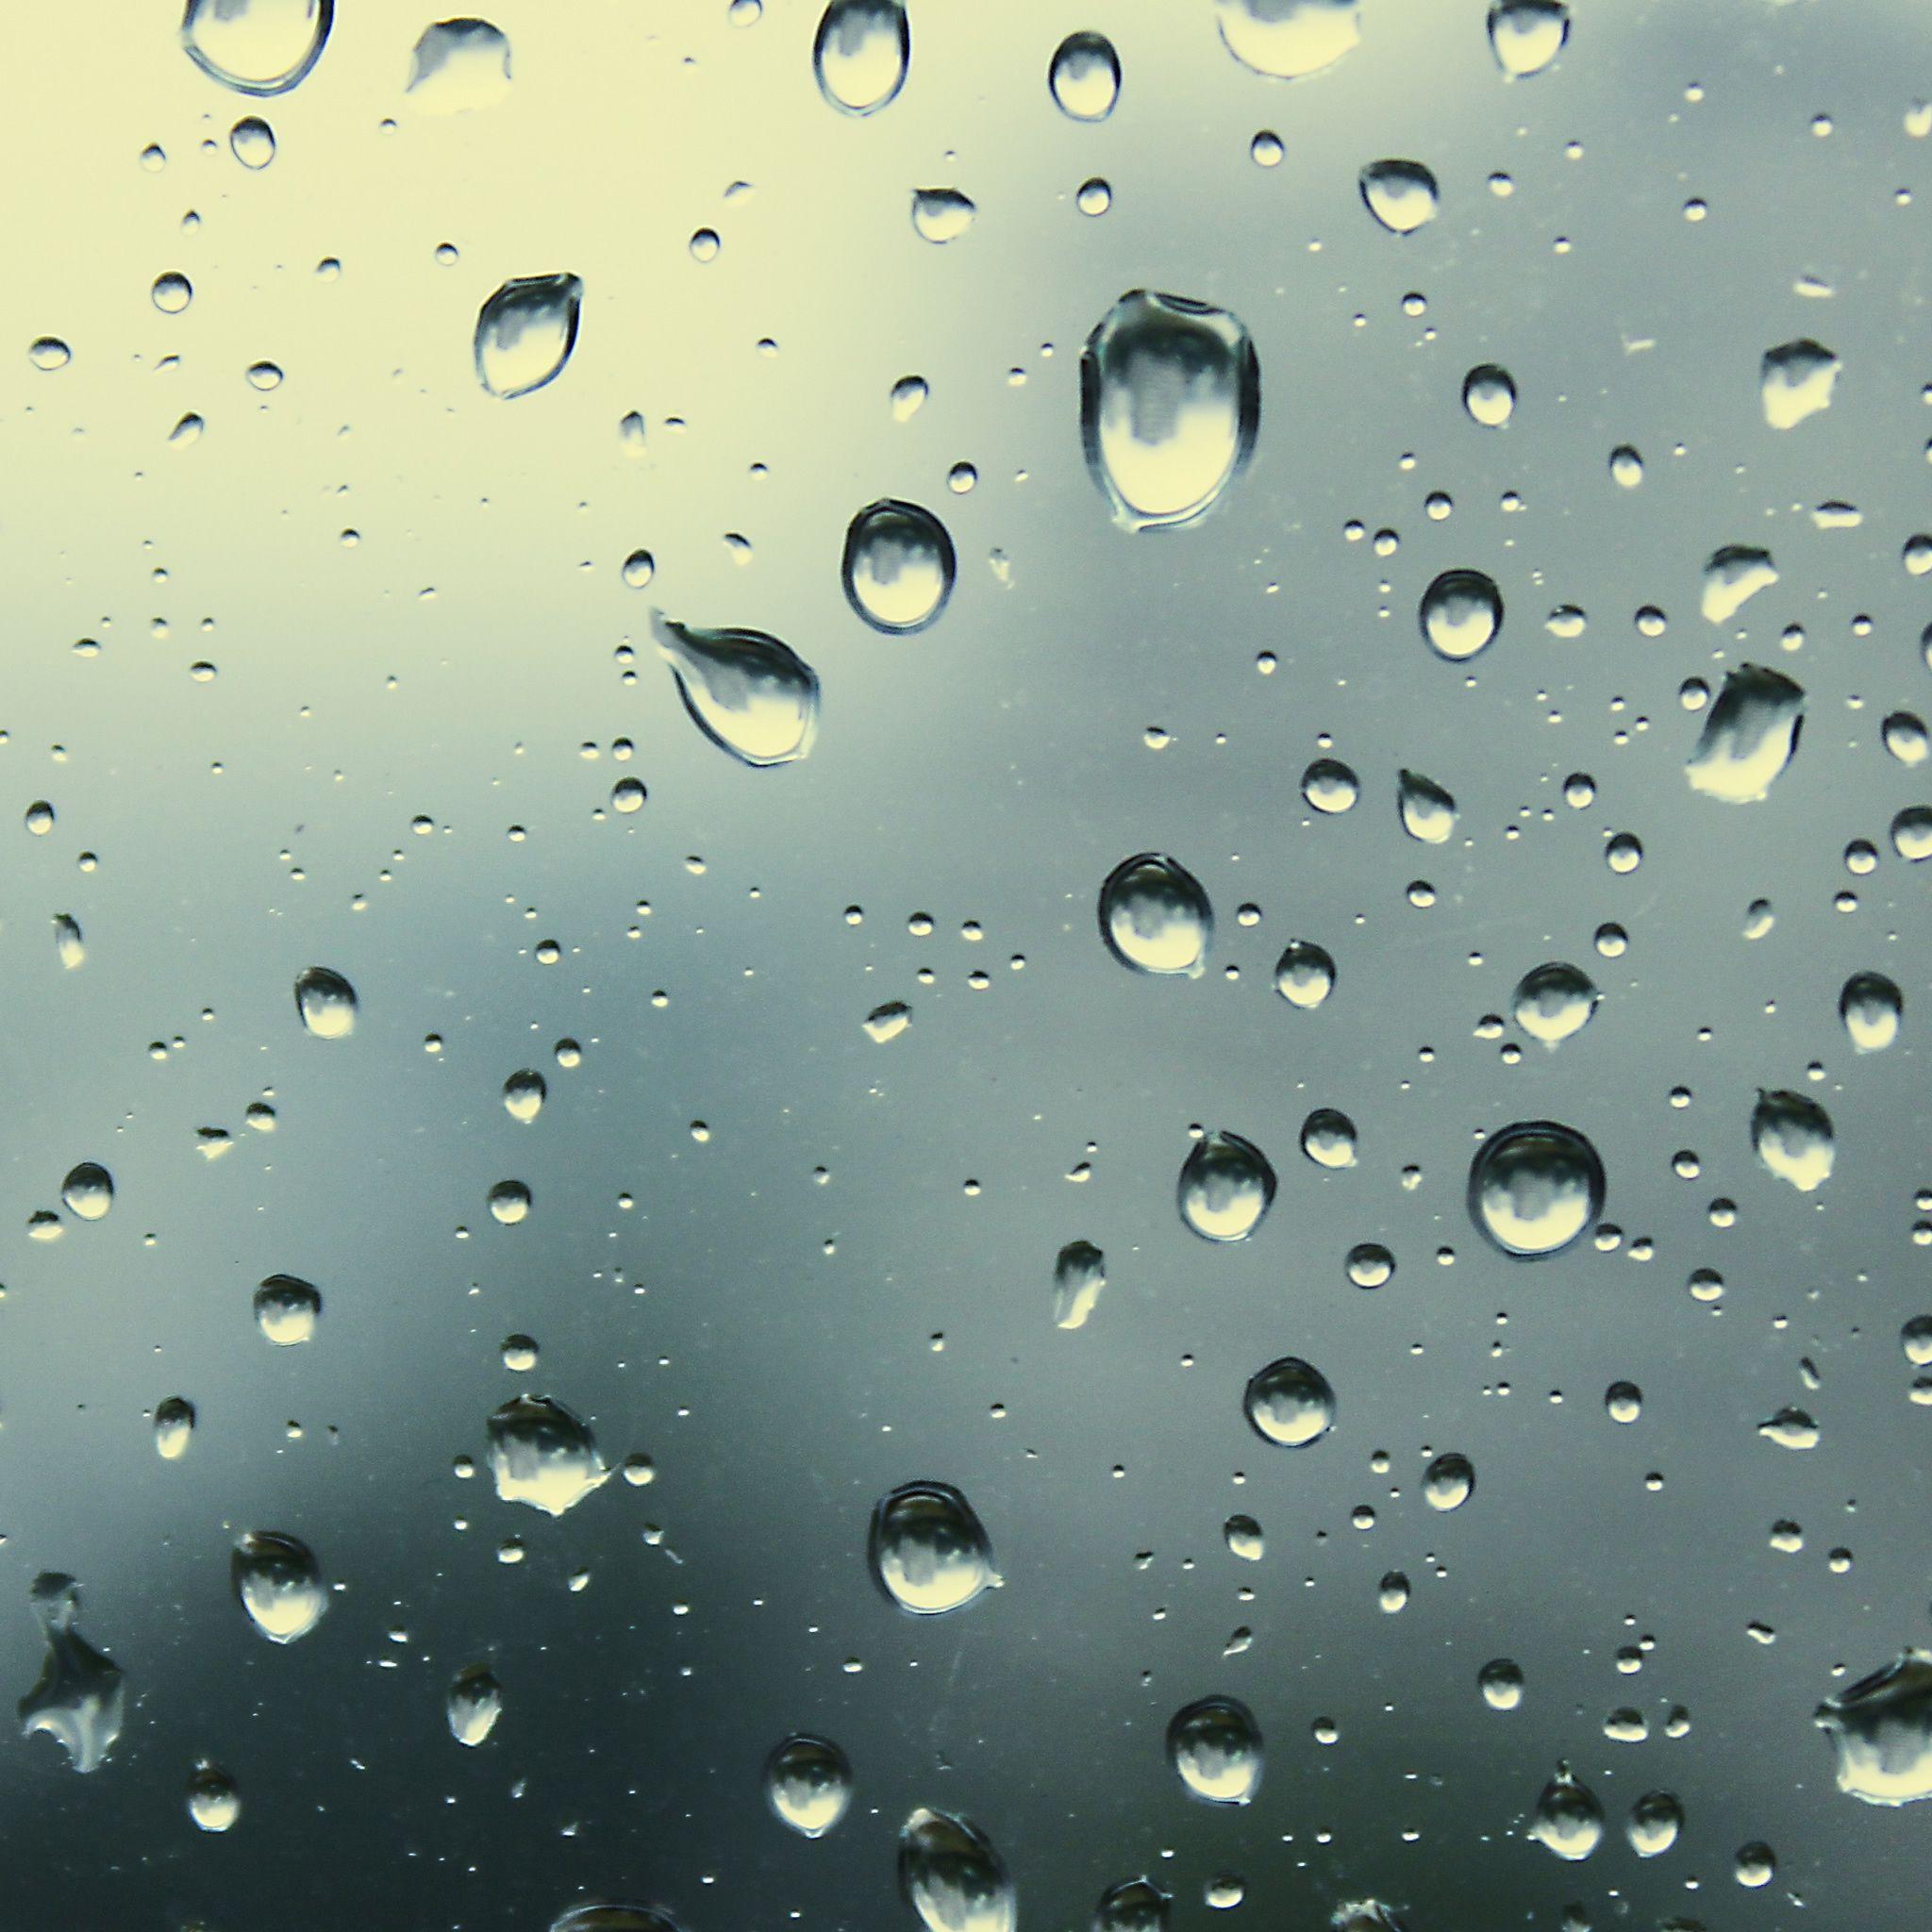 Rain Drops 5 iPad Air Wallpaper Download iPhone